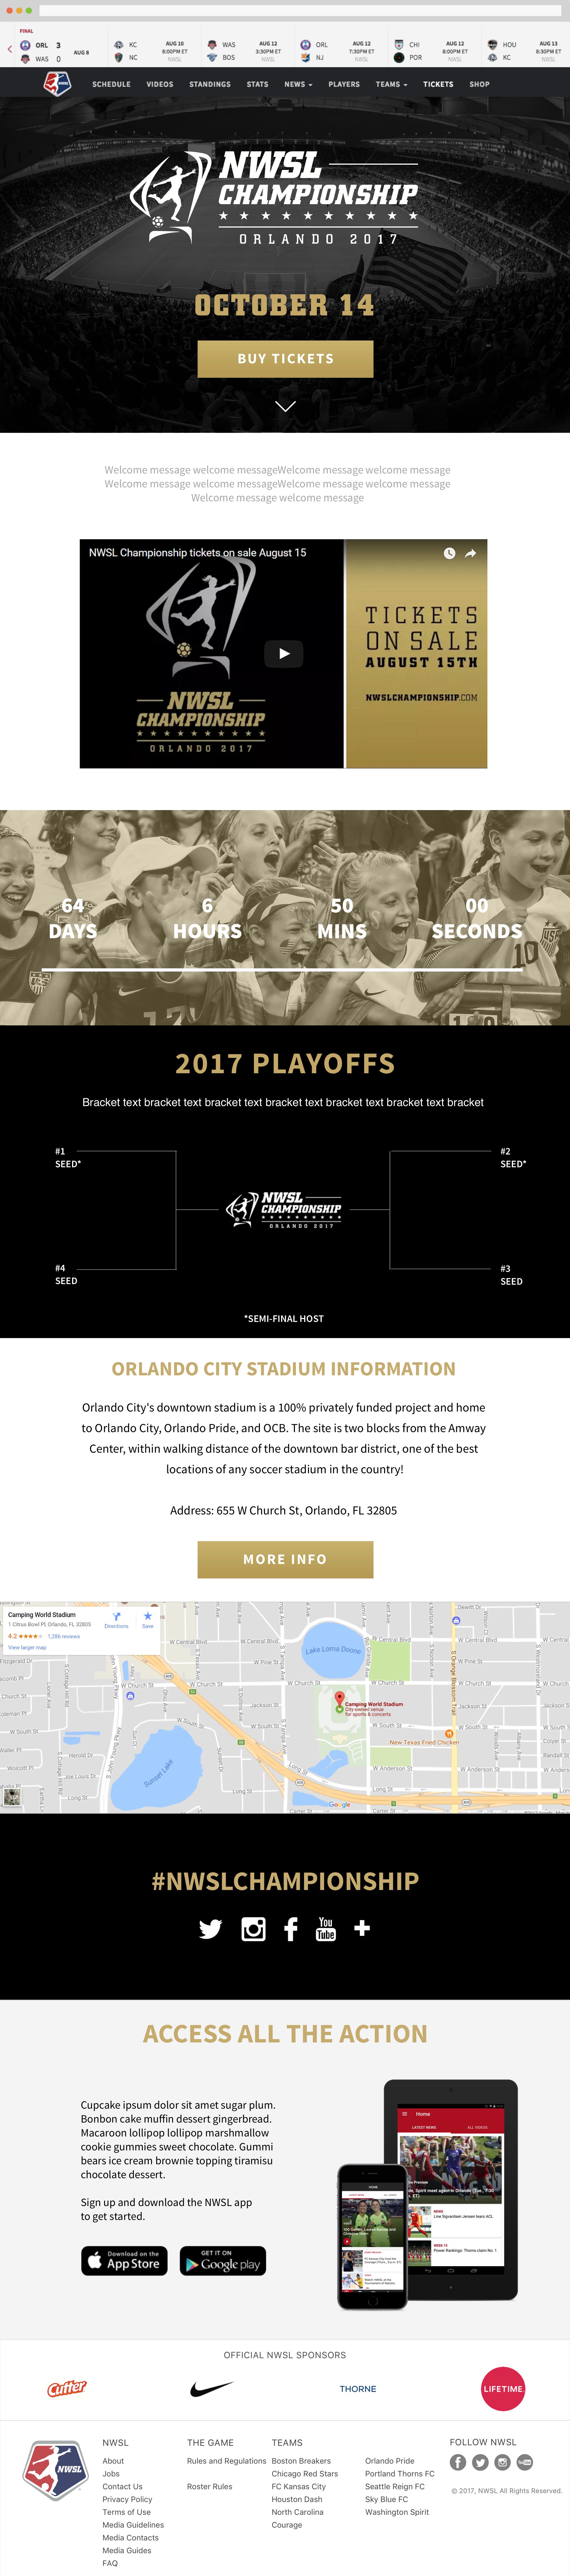 Championship-page